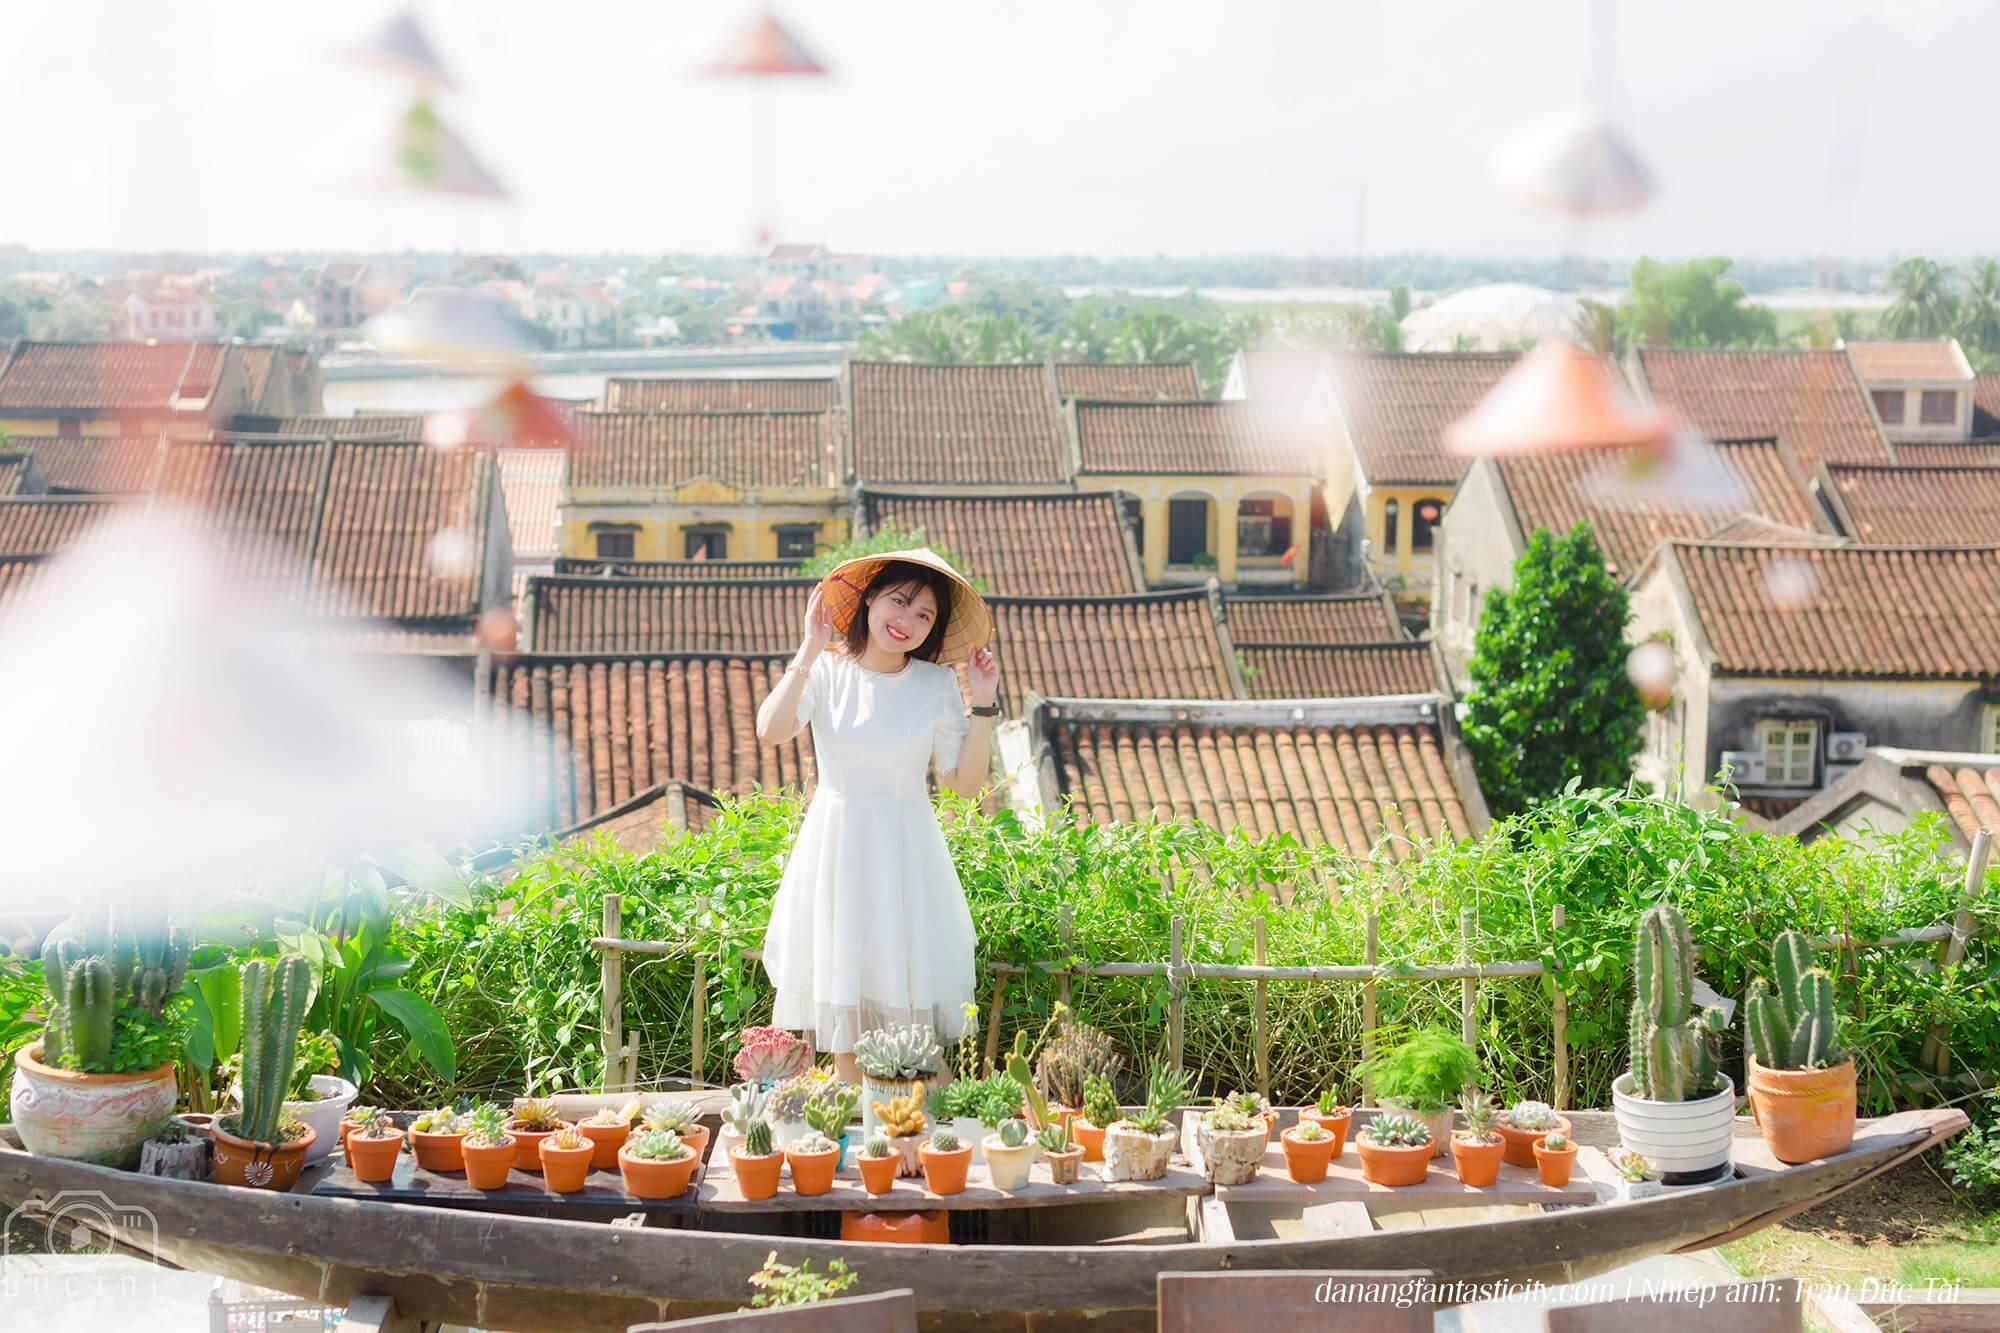 Pho Coi Hoi An Den Danang Hoi An Quang Nam Dung Quen Check In 03 Dia Diem Sieu Dep Nay